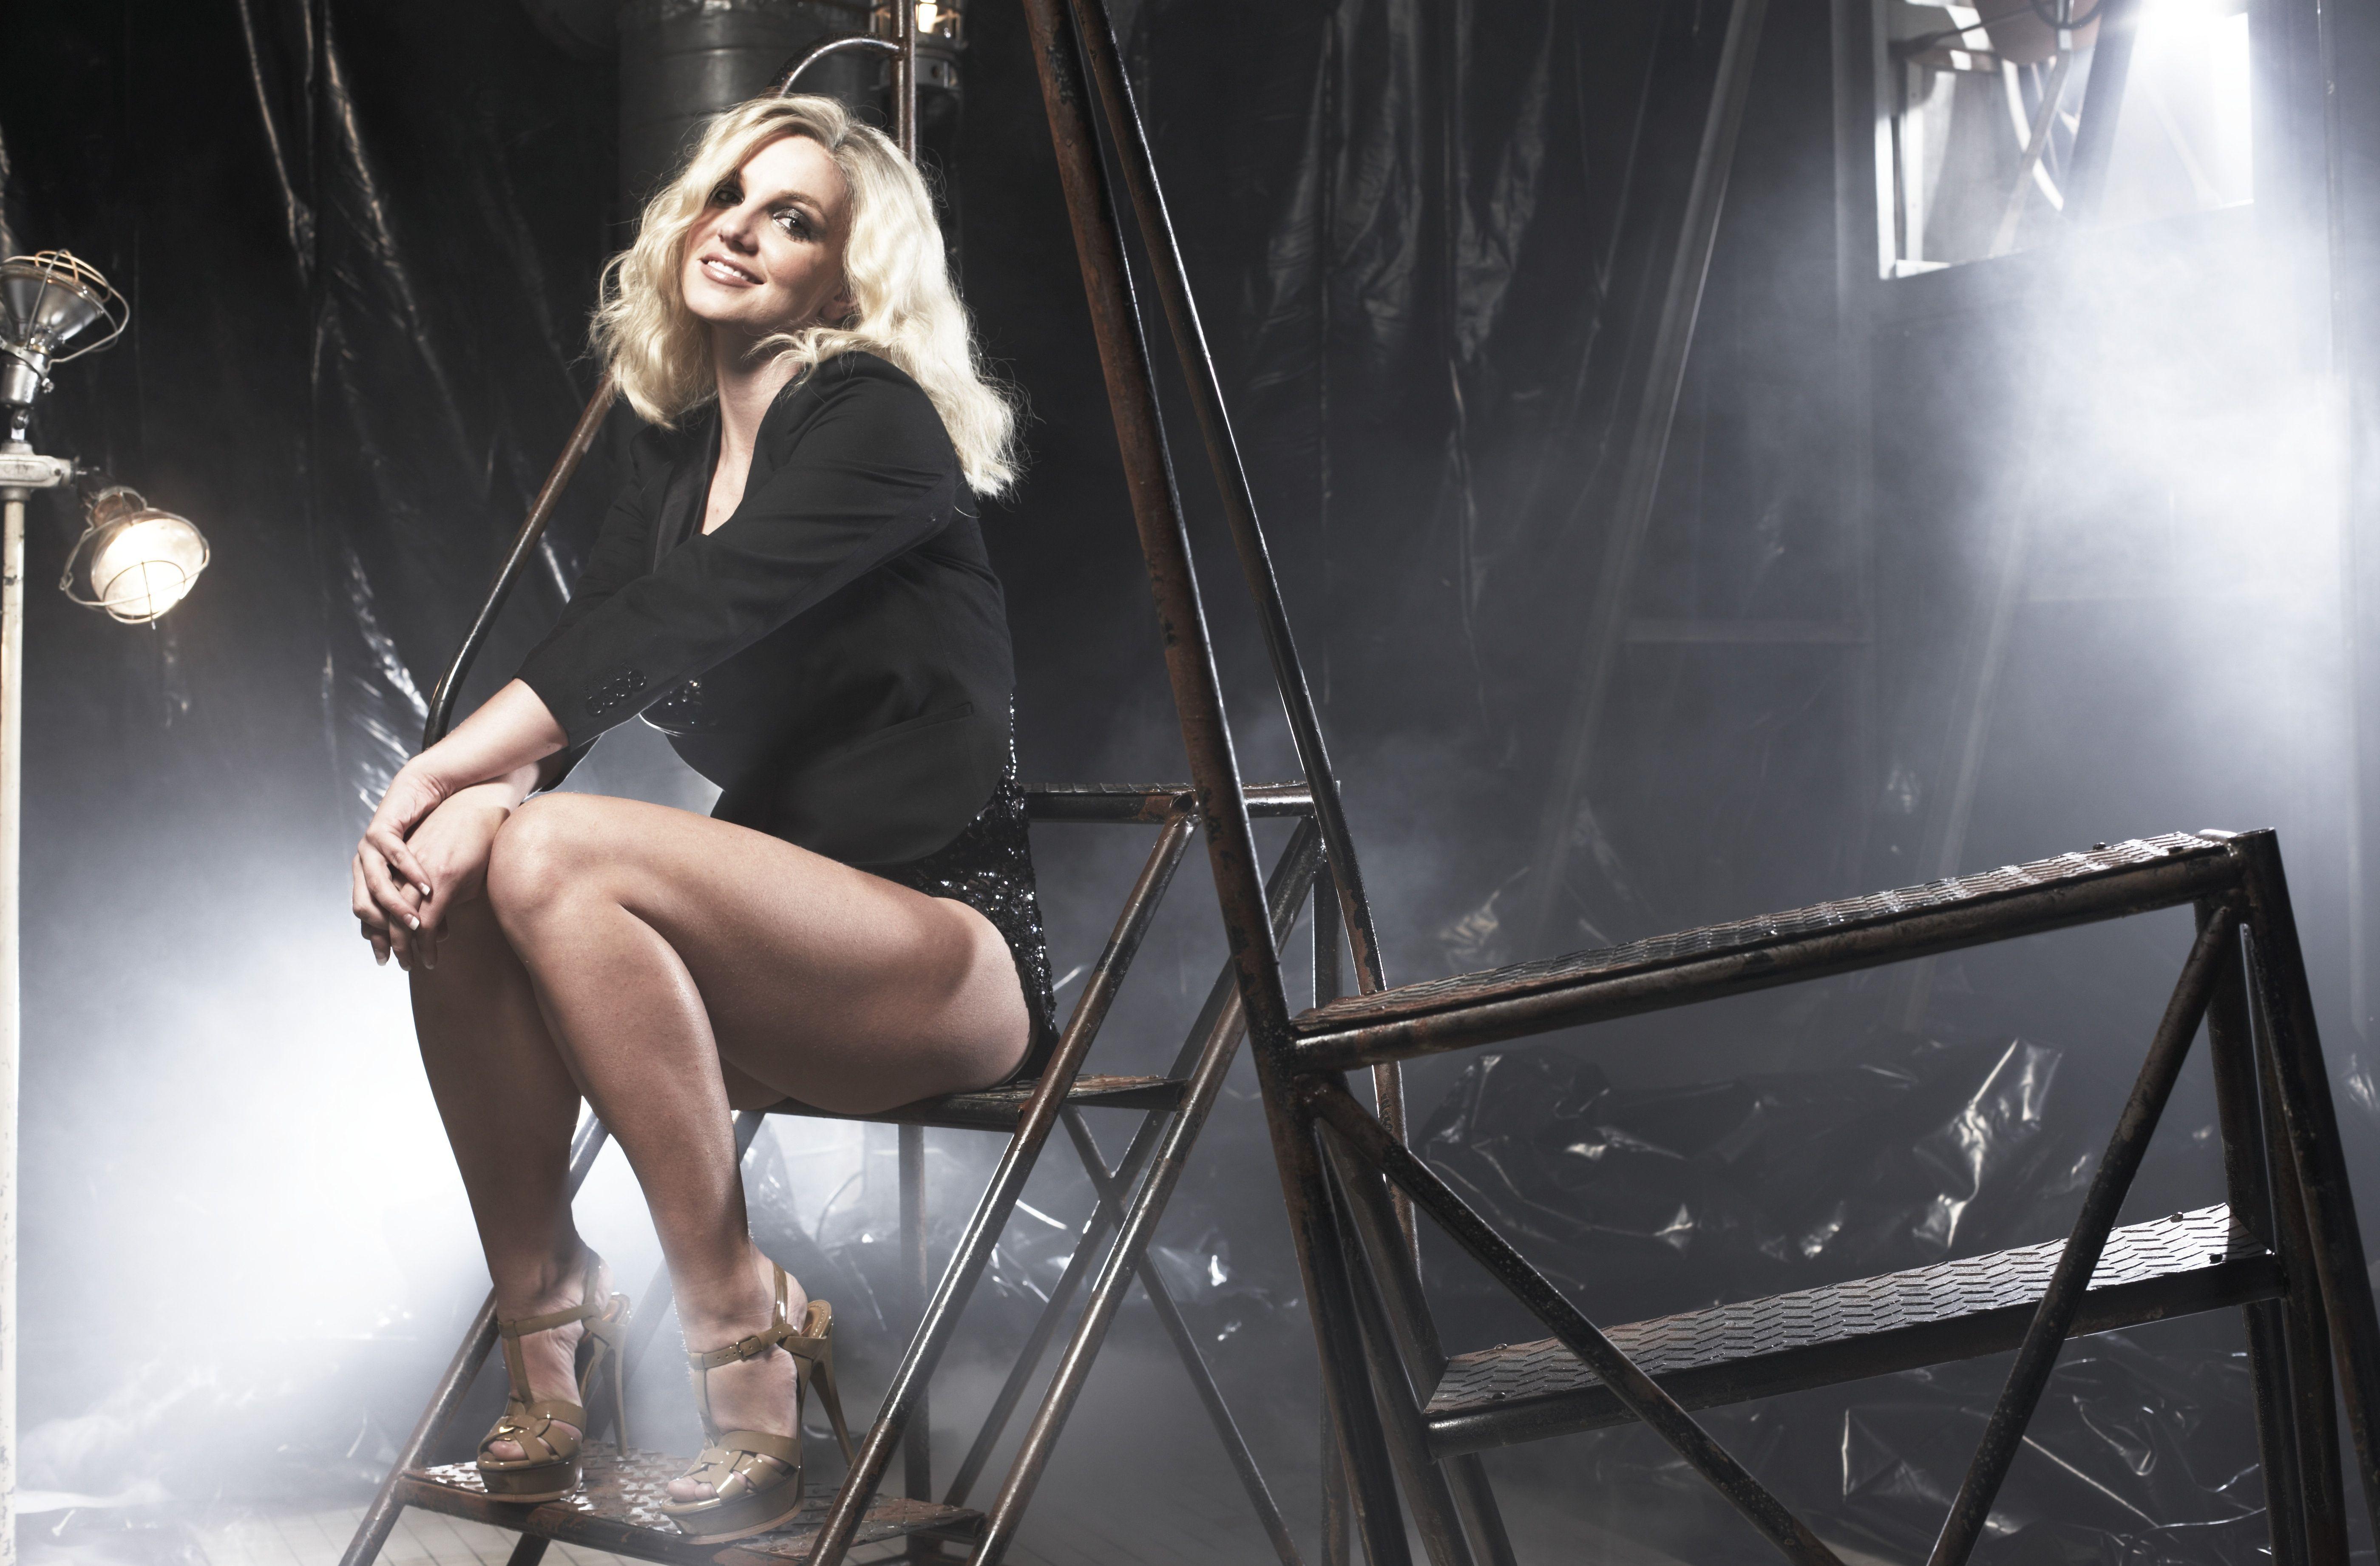 Britney Spears photo 6468 of 7985 pics, wallpaper - photo ... бритни спирс